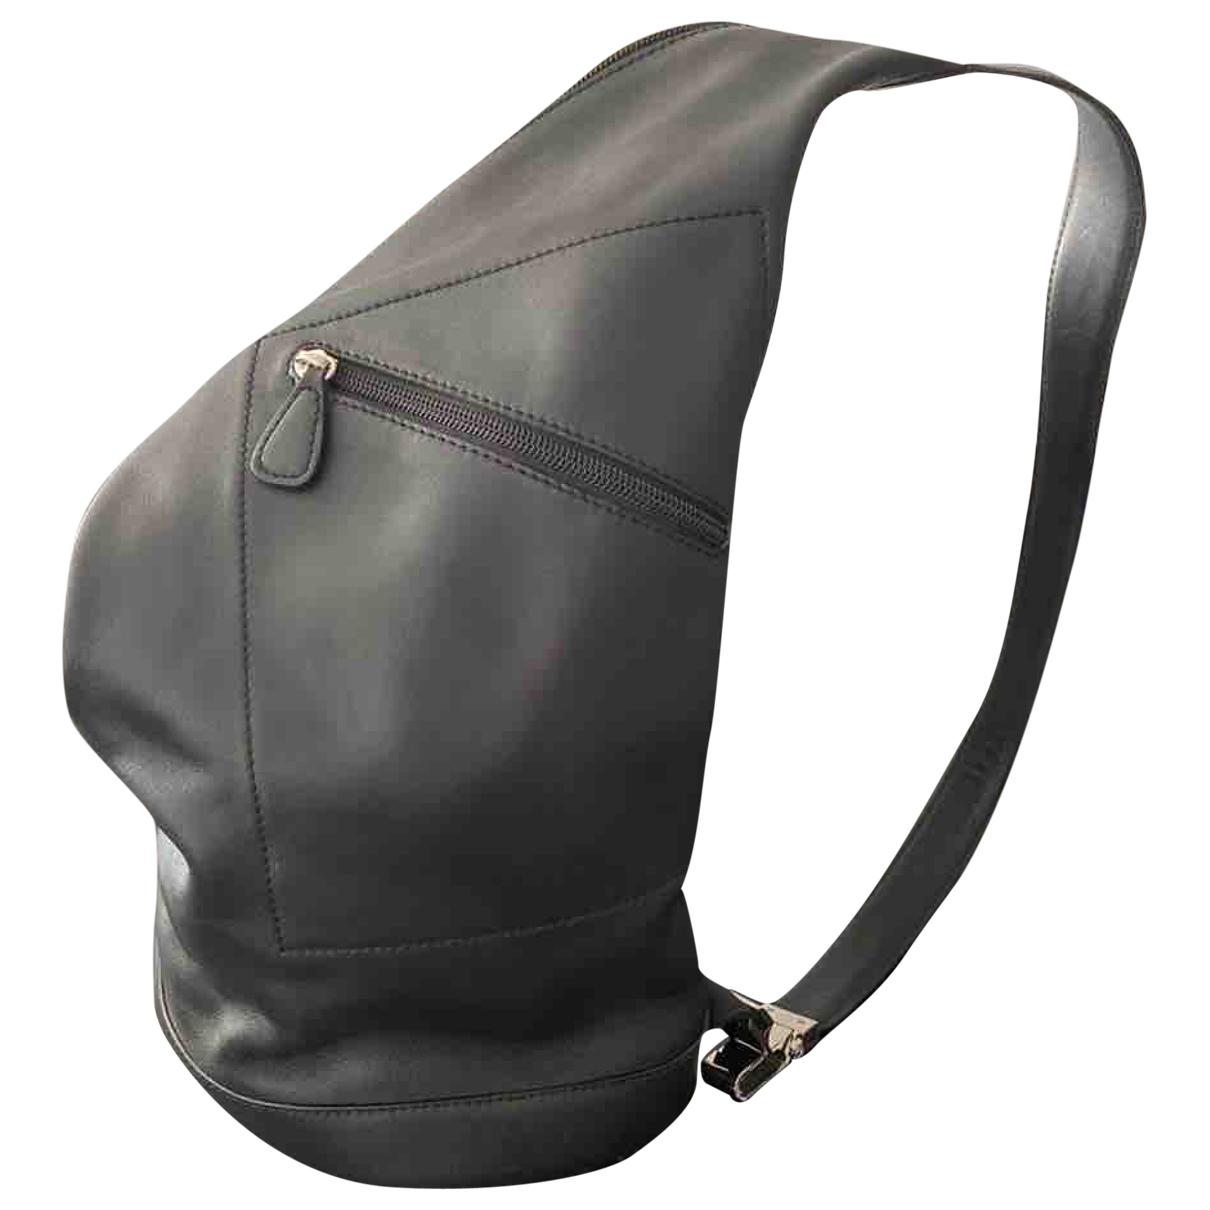 Loewe - Sac a dos Anton pour femme en cuir - gris